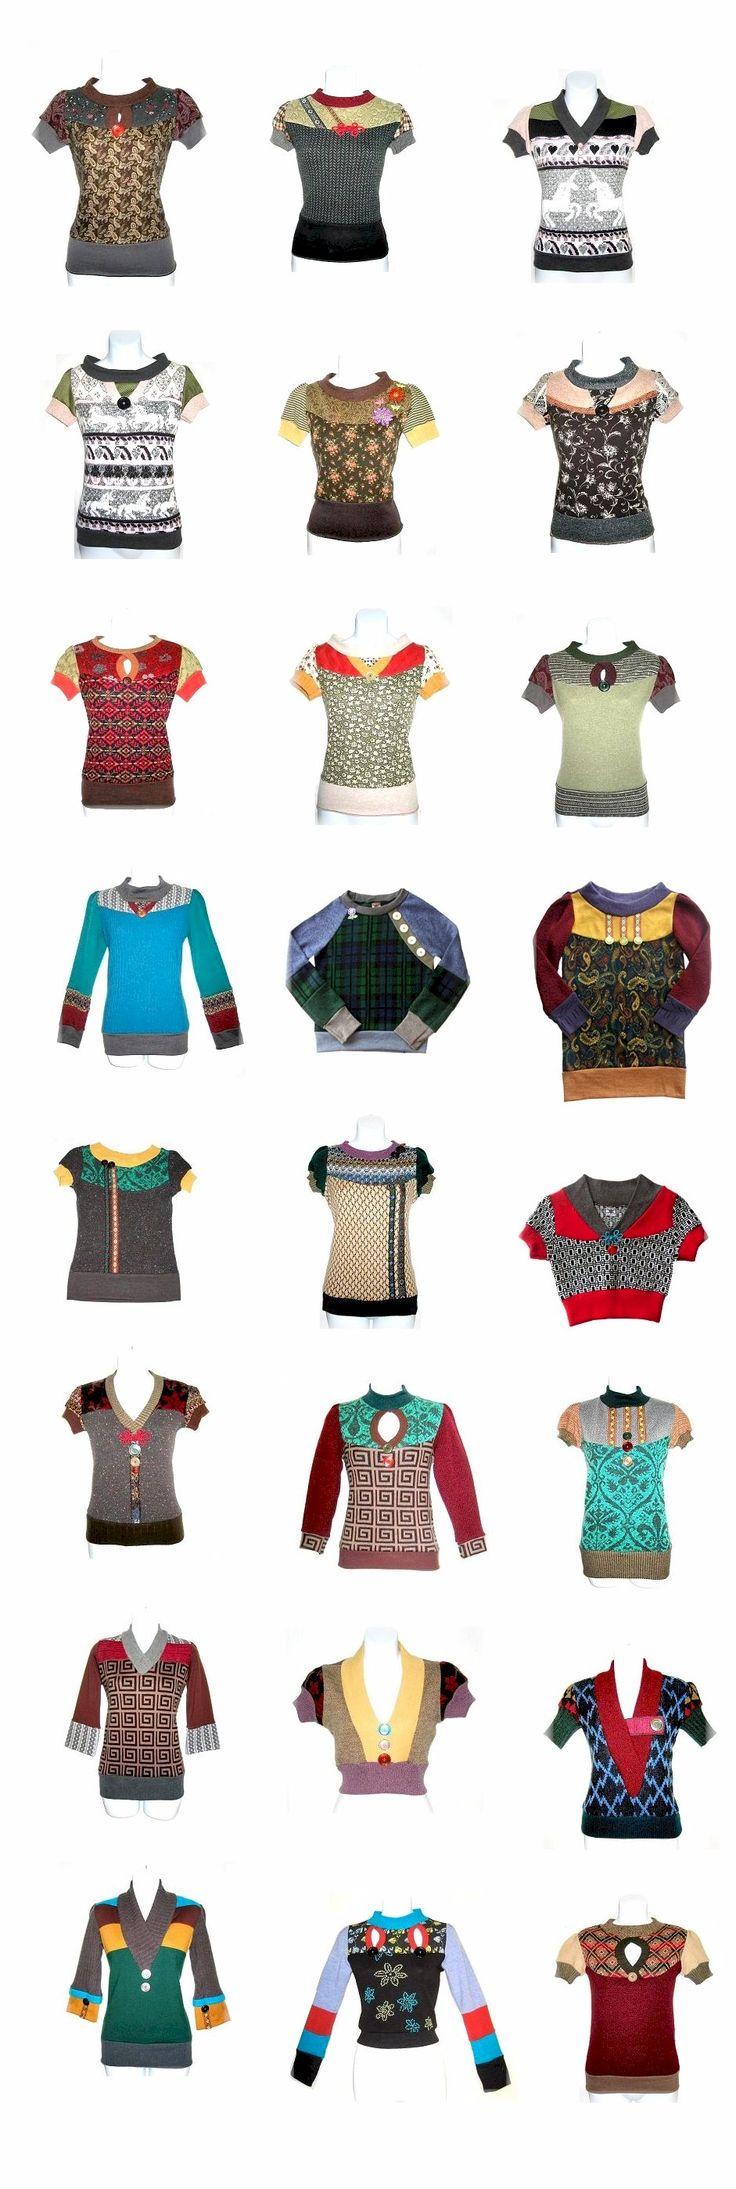 diy inspiration: recycle old sweaters! (Nur Anregungen, keine Anleitung.)